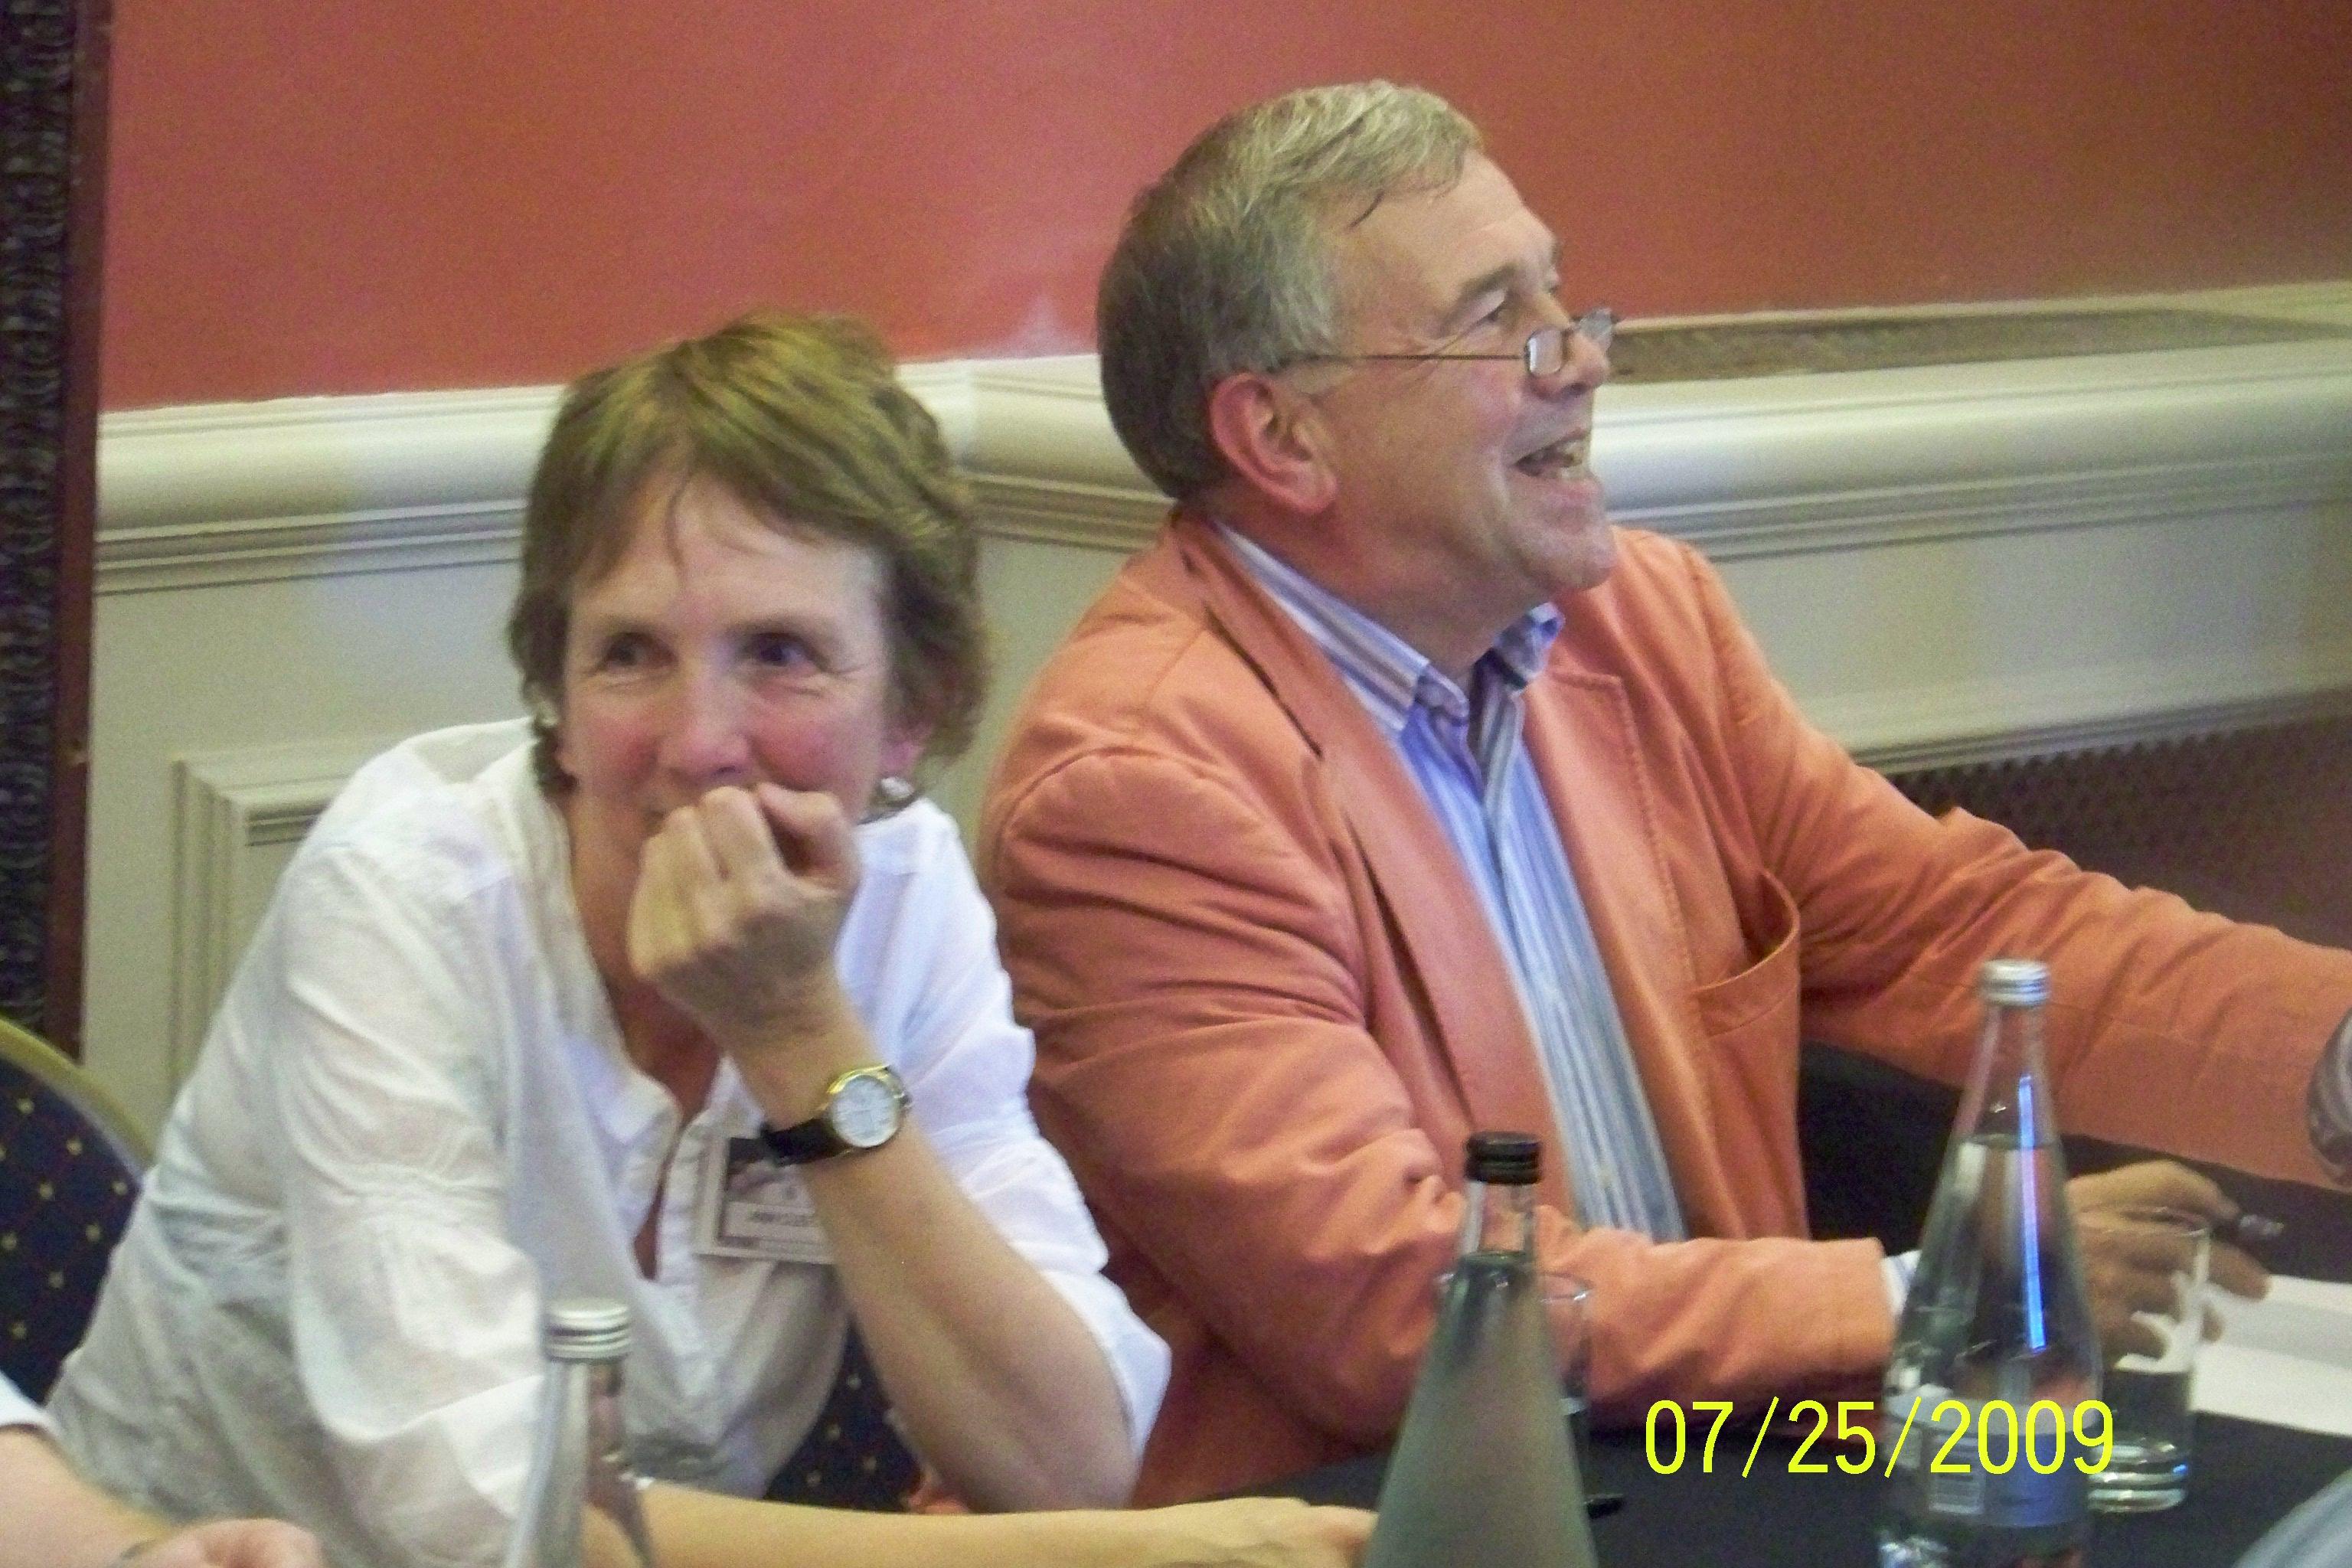 Ann Cleaves and Simon Brett